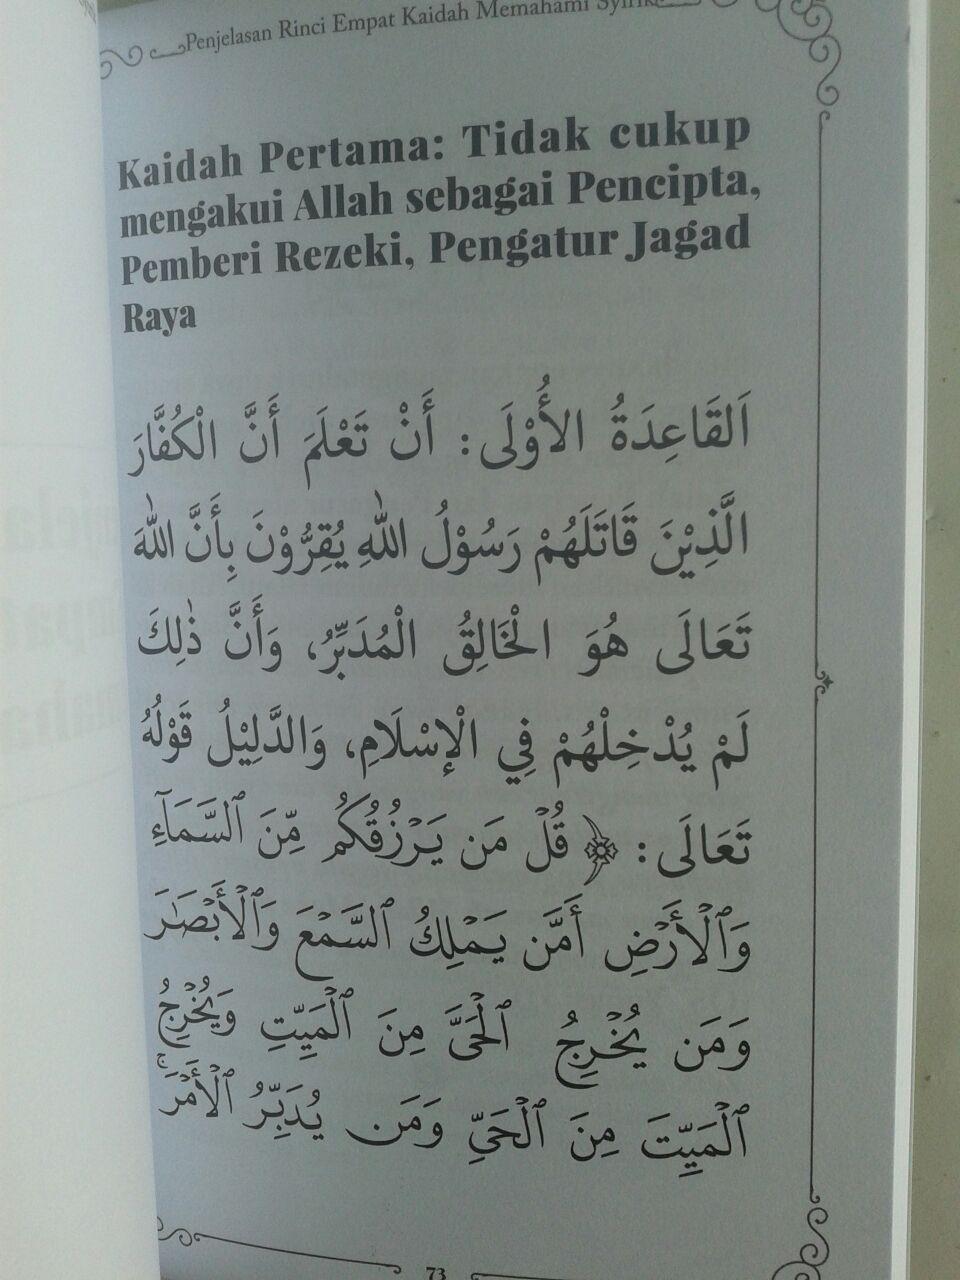 Buku Muslim Tetapi Musyrik Empat Kaidah Memahami Syirik isi